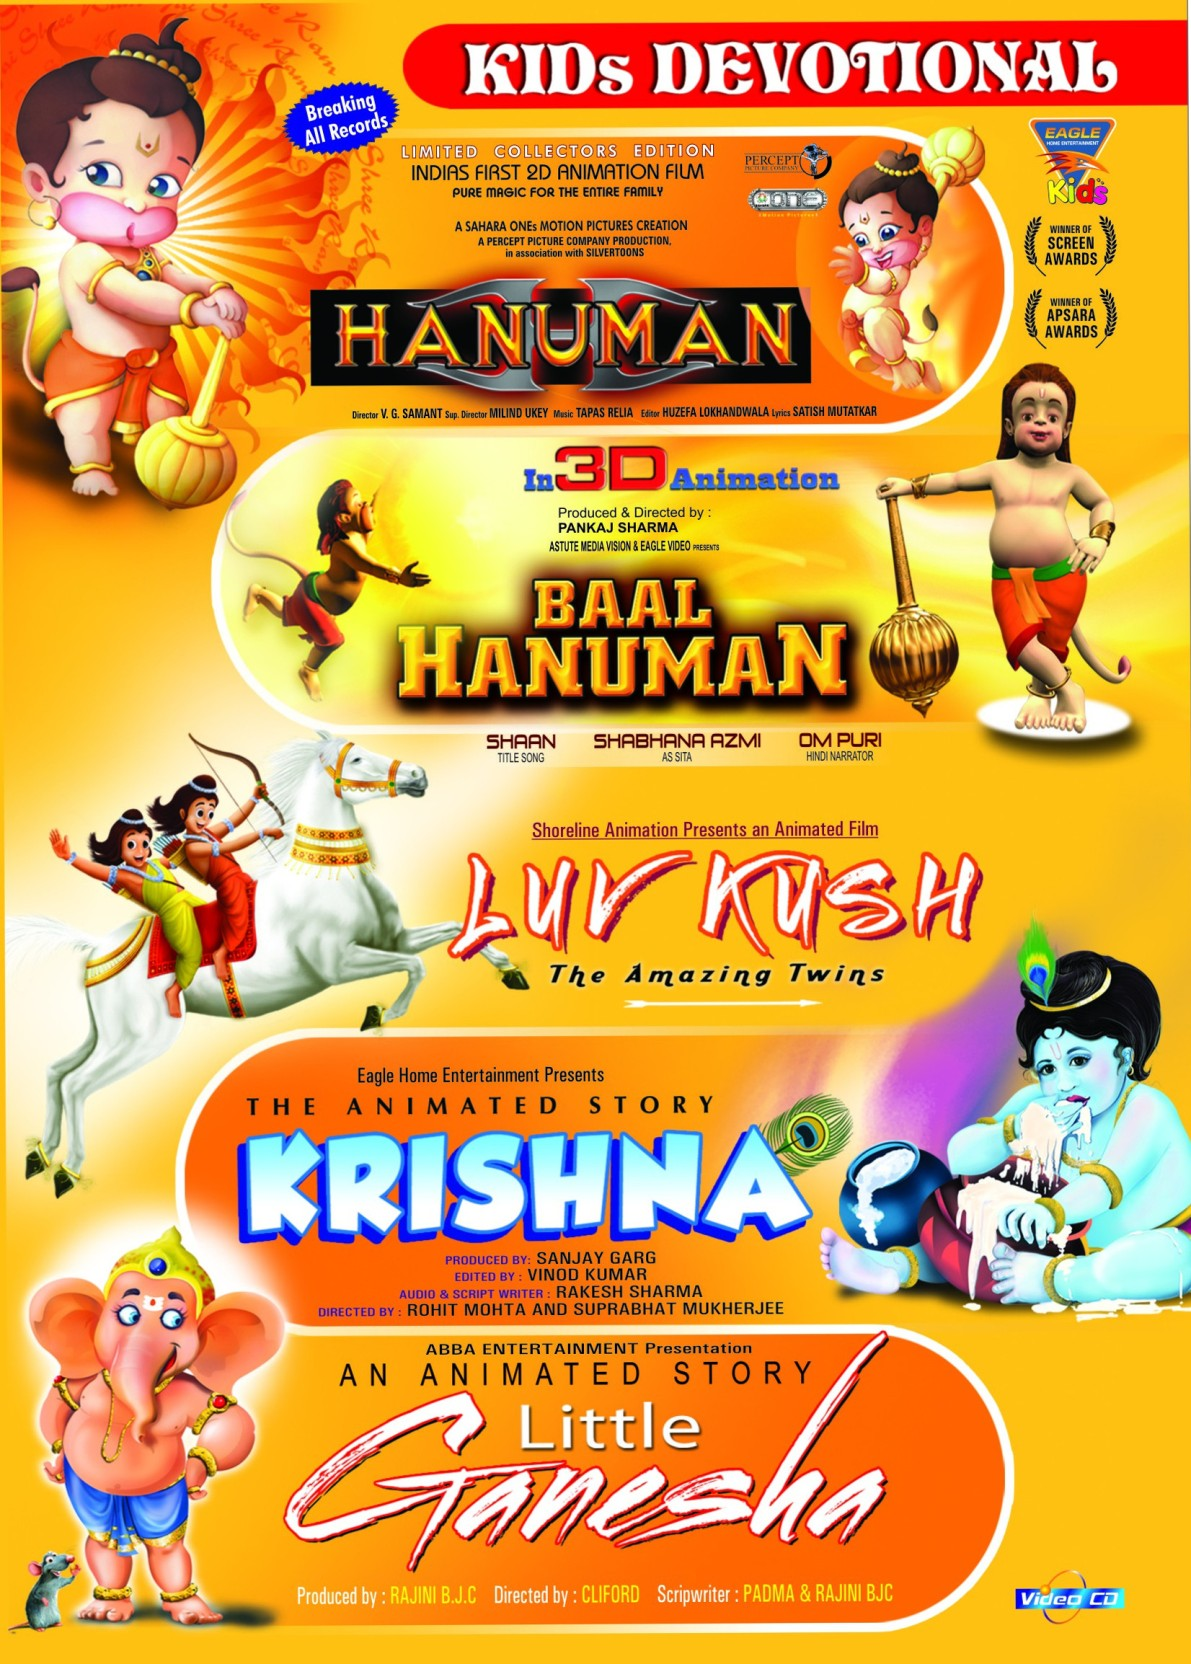 Kids Devotional - Hanuman/Baal Hanuman/Luv Kush/Krishna/Little